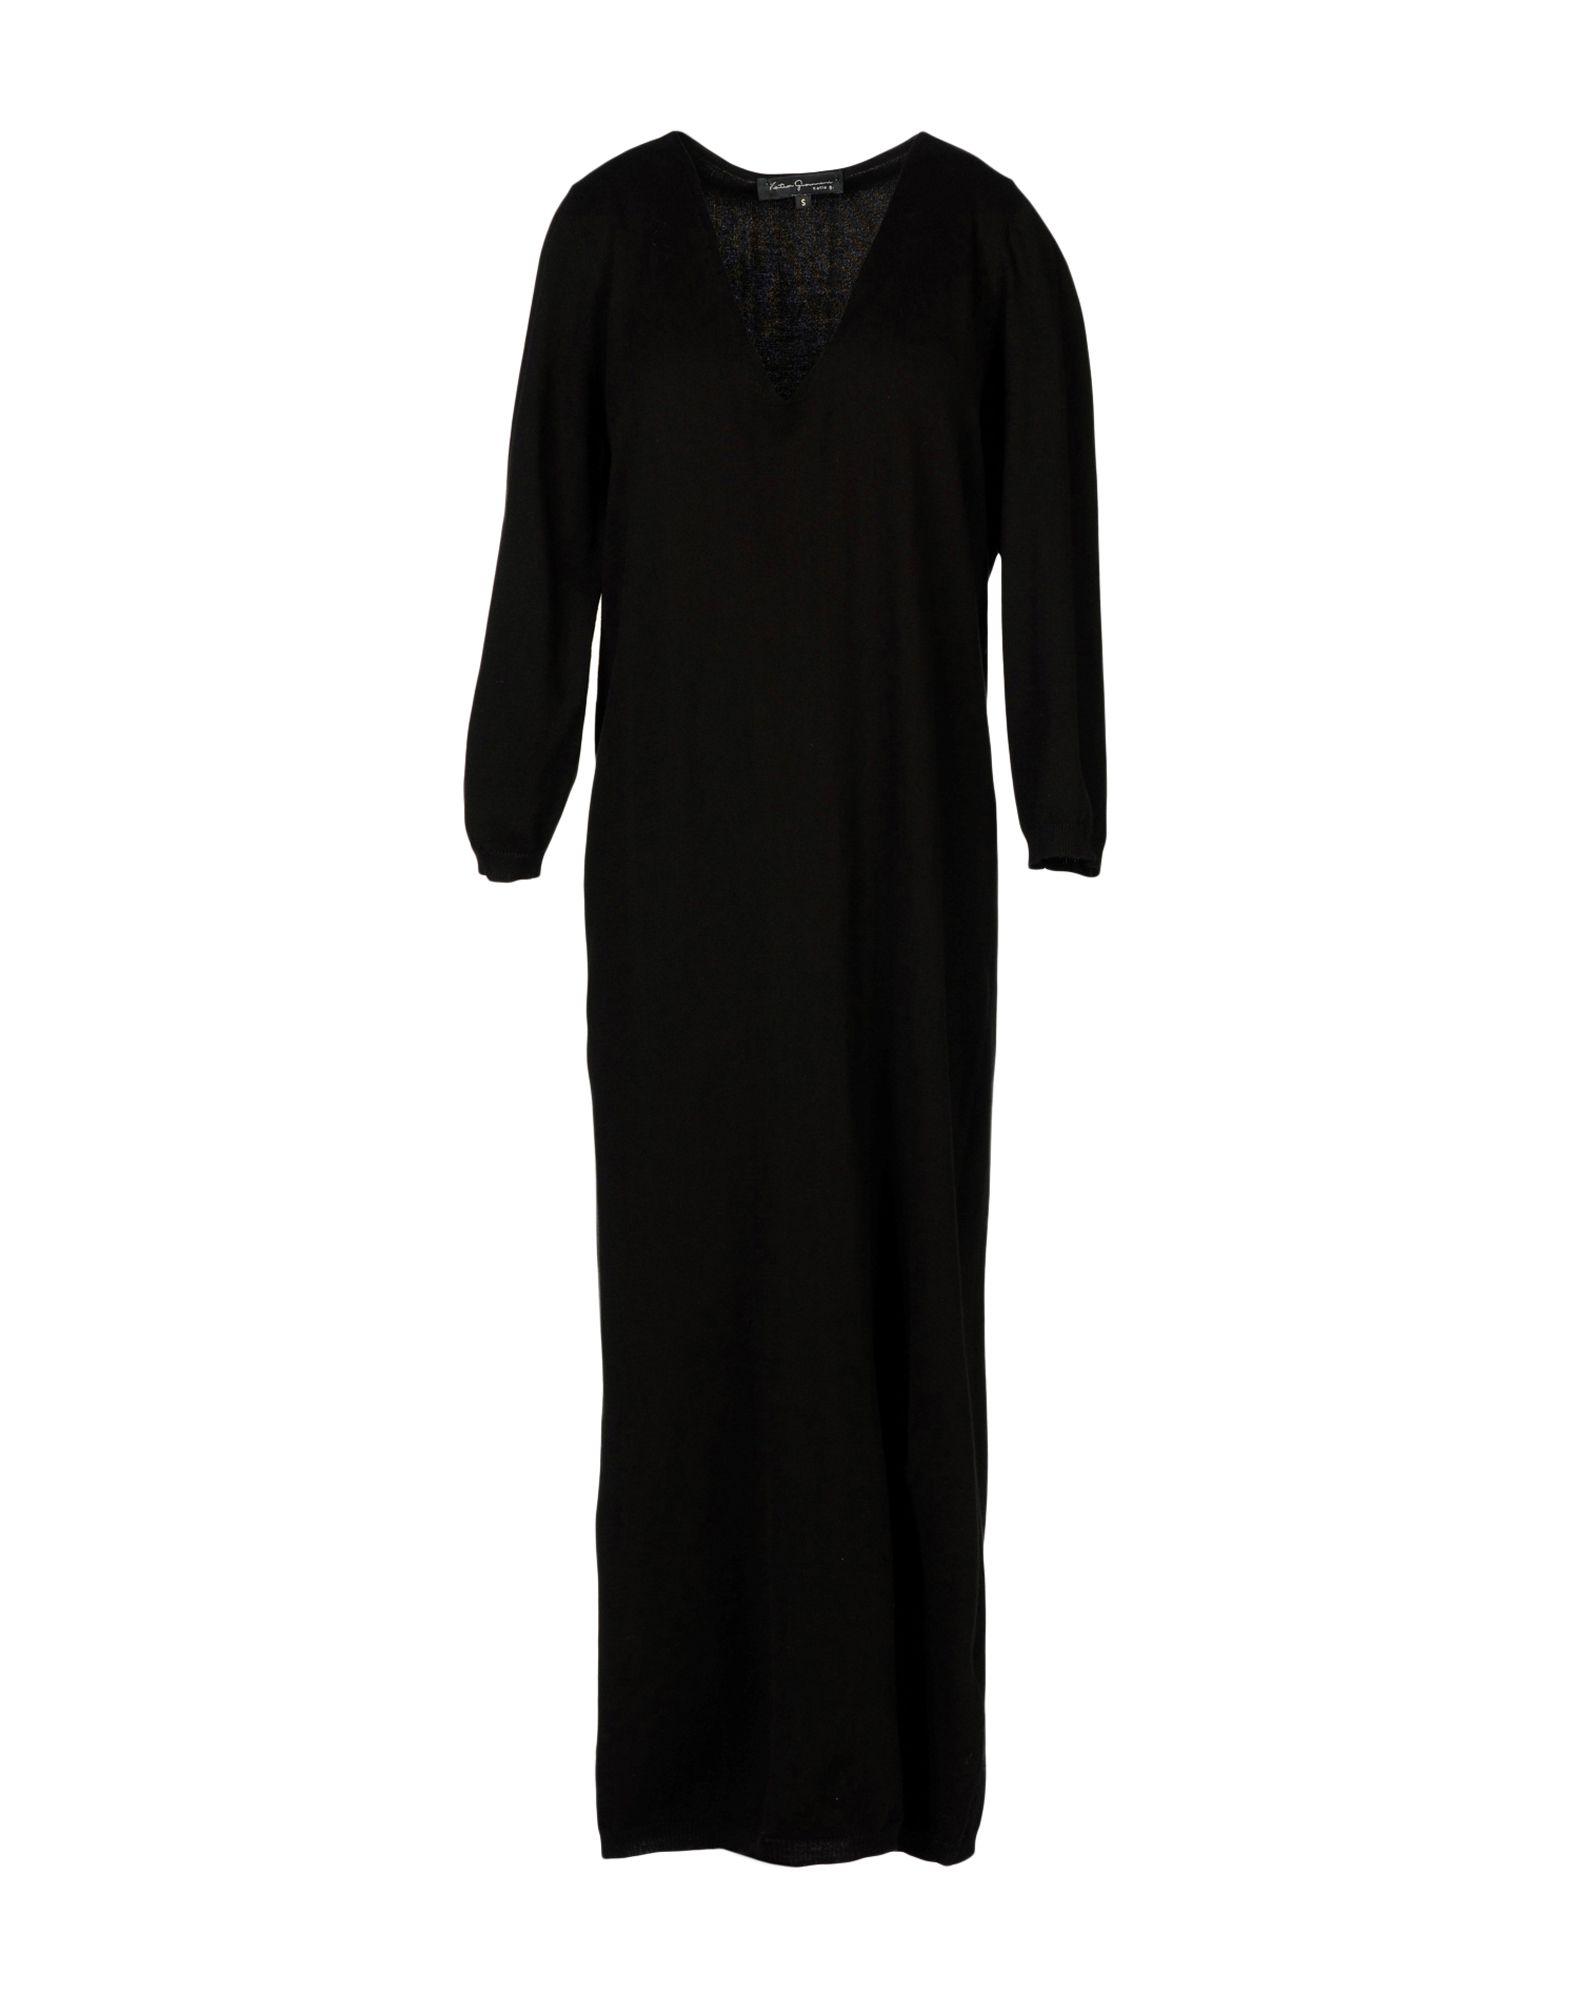 Vestito Longuette Longuette Katia Giannini donna - 34789565RE  bis zu 42% Rabatt